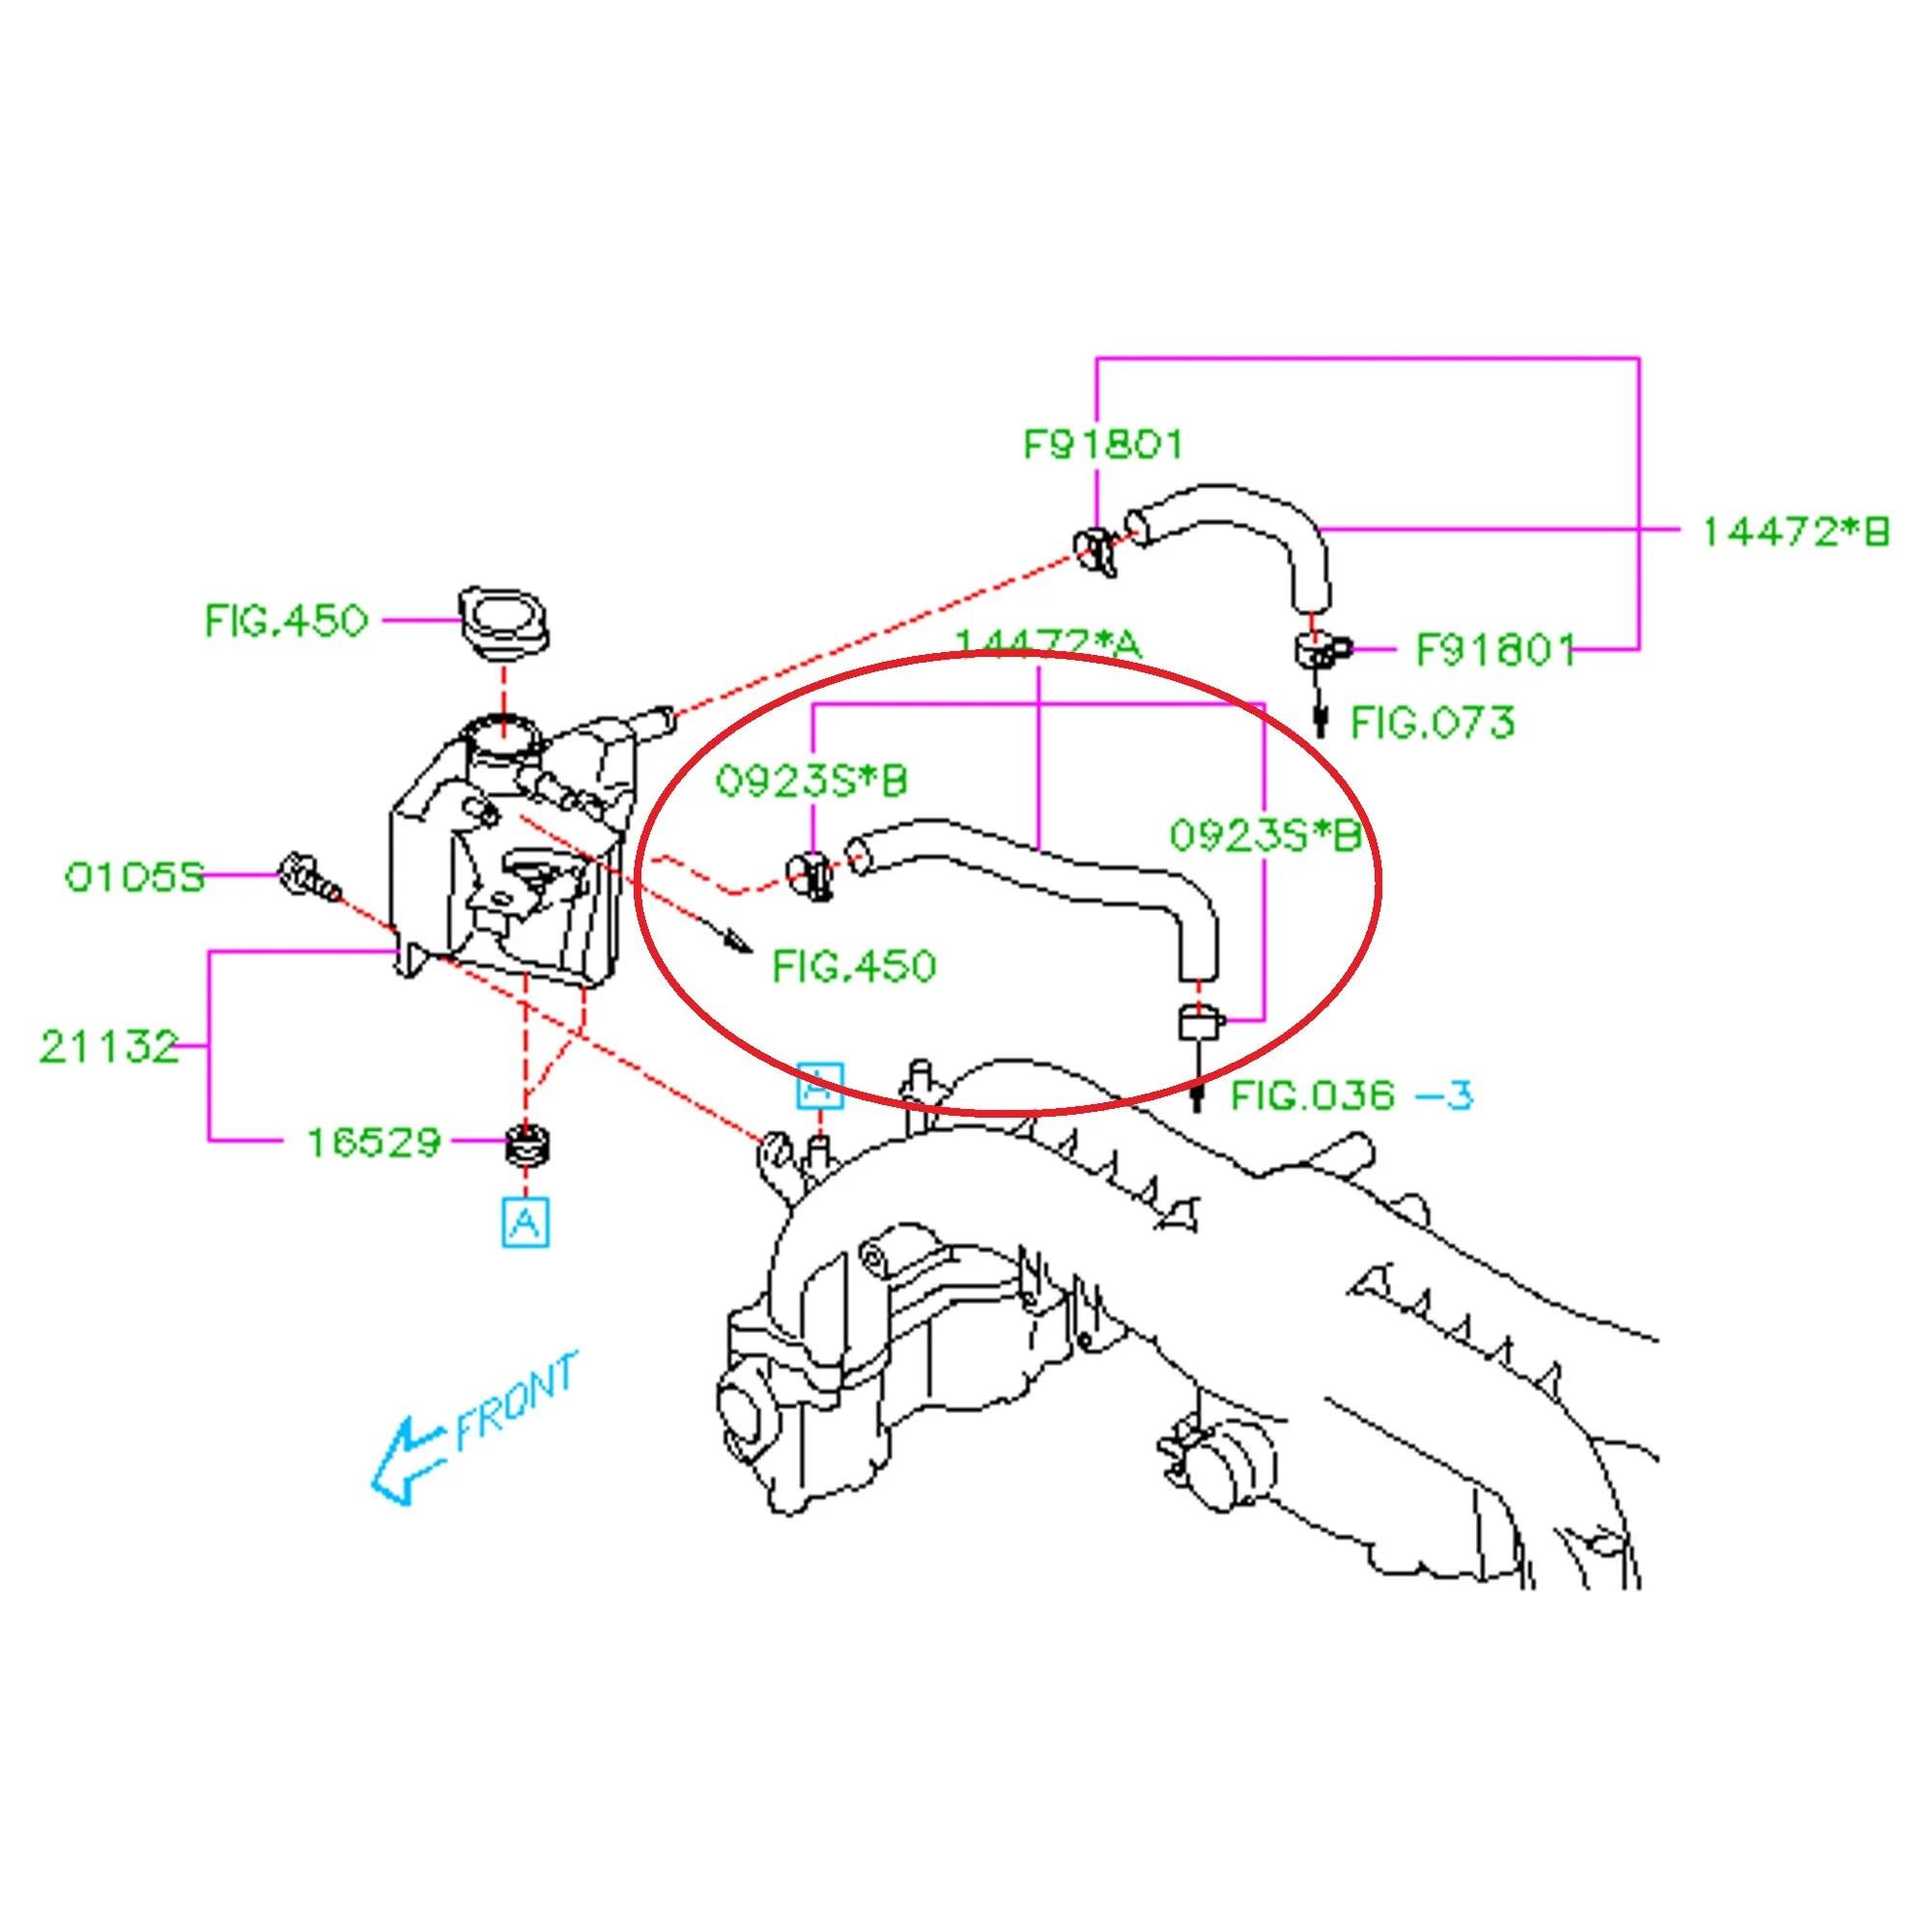 vacuum line diagram on 2004 subaru impreza wrx sti parts diagram subaru wrx wiring diagram 2002 [ 2000 x 2000 Pixel ]